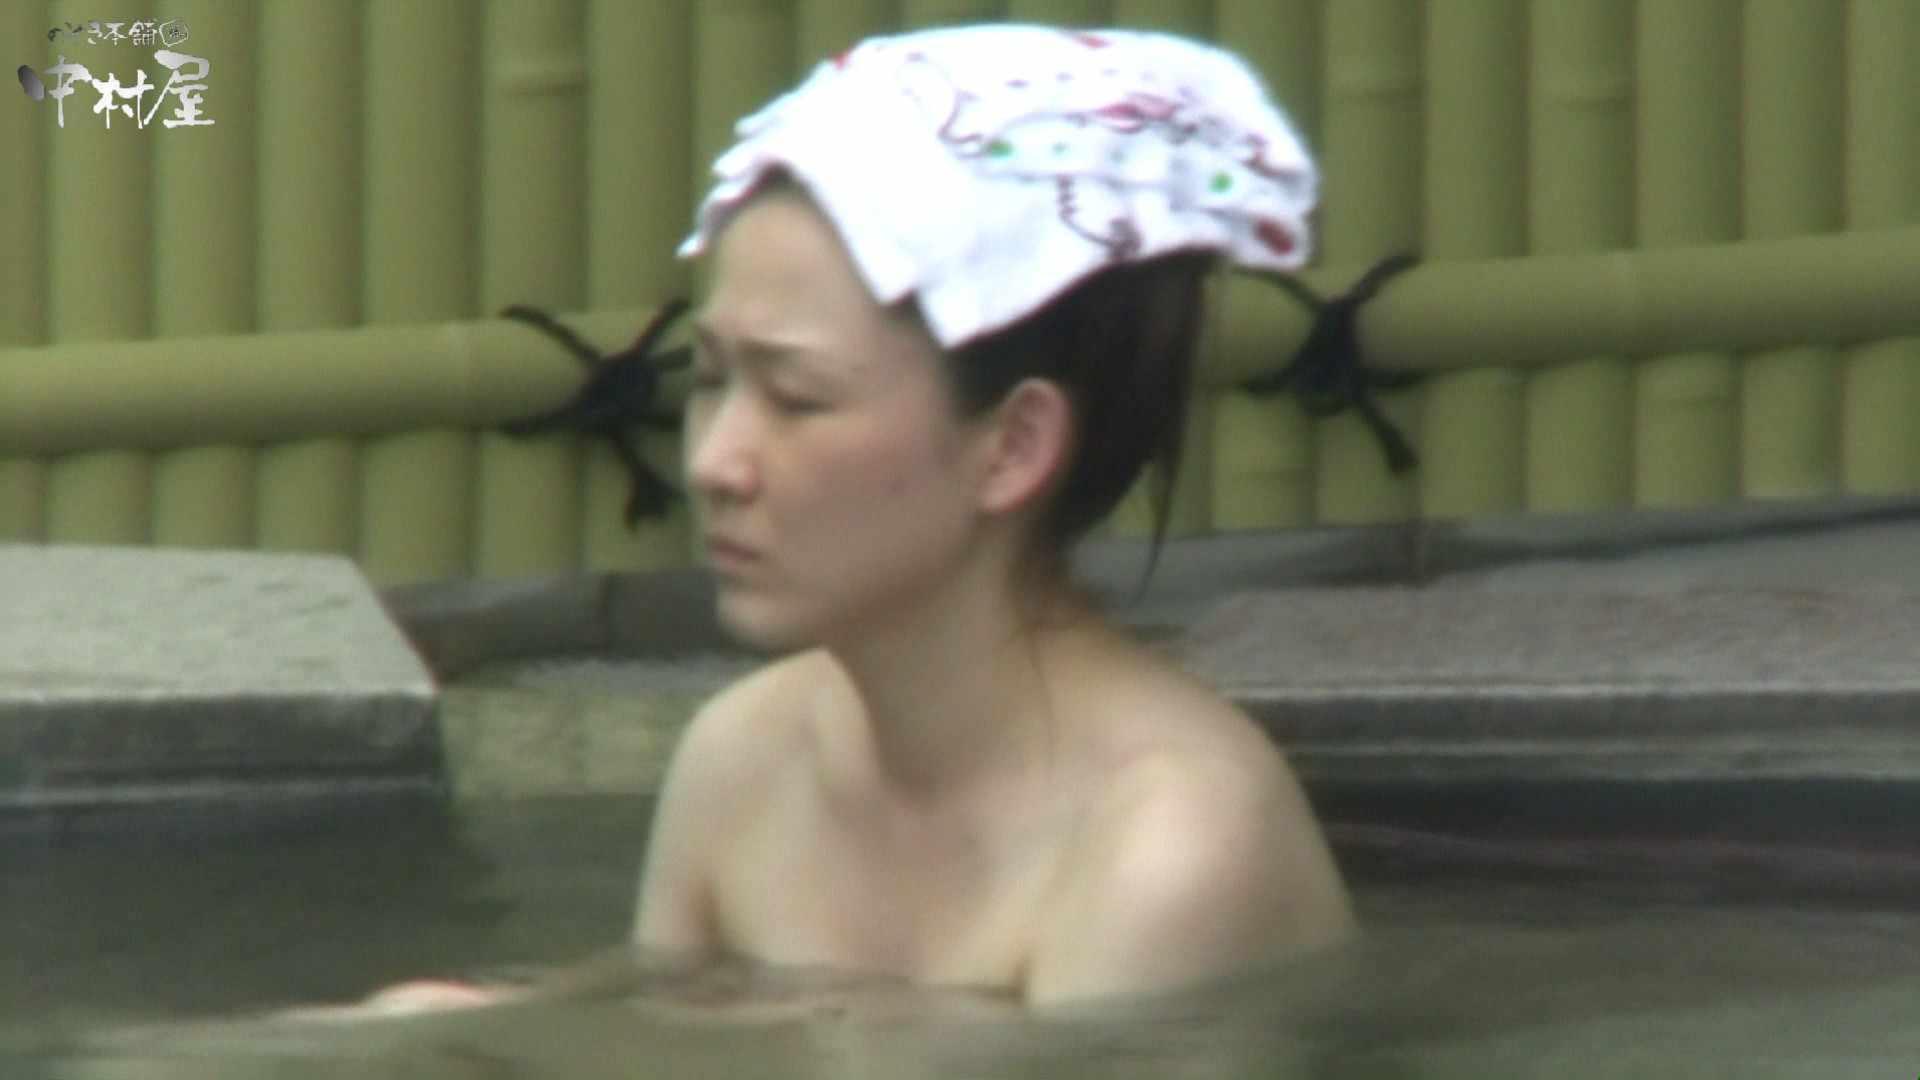 Aquaな露天風呂Vol.943 盗撮  53連発 3